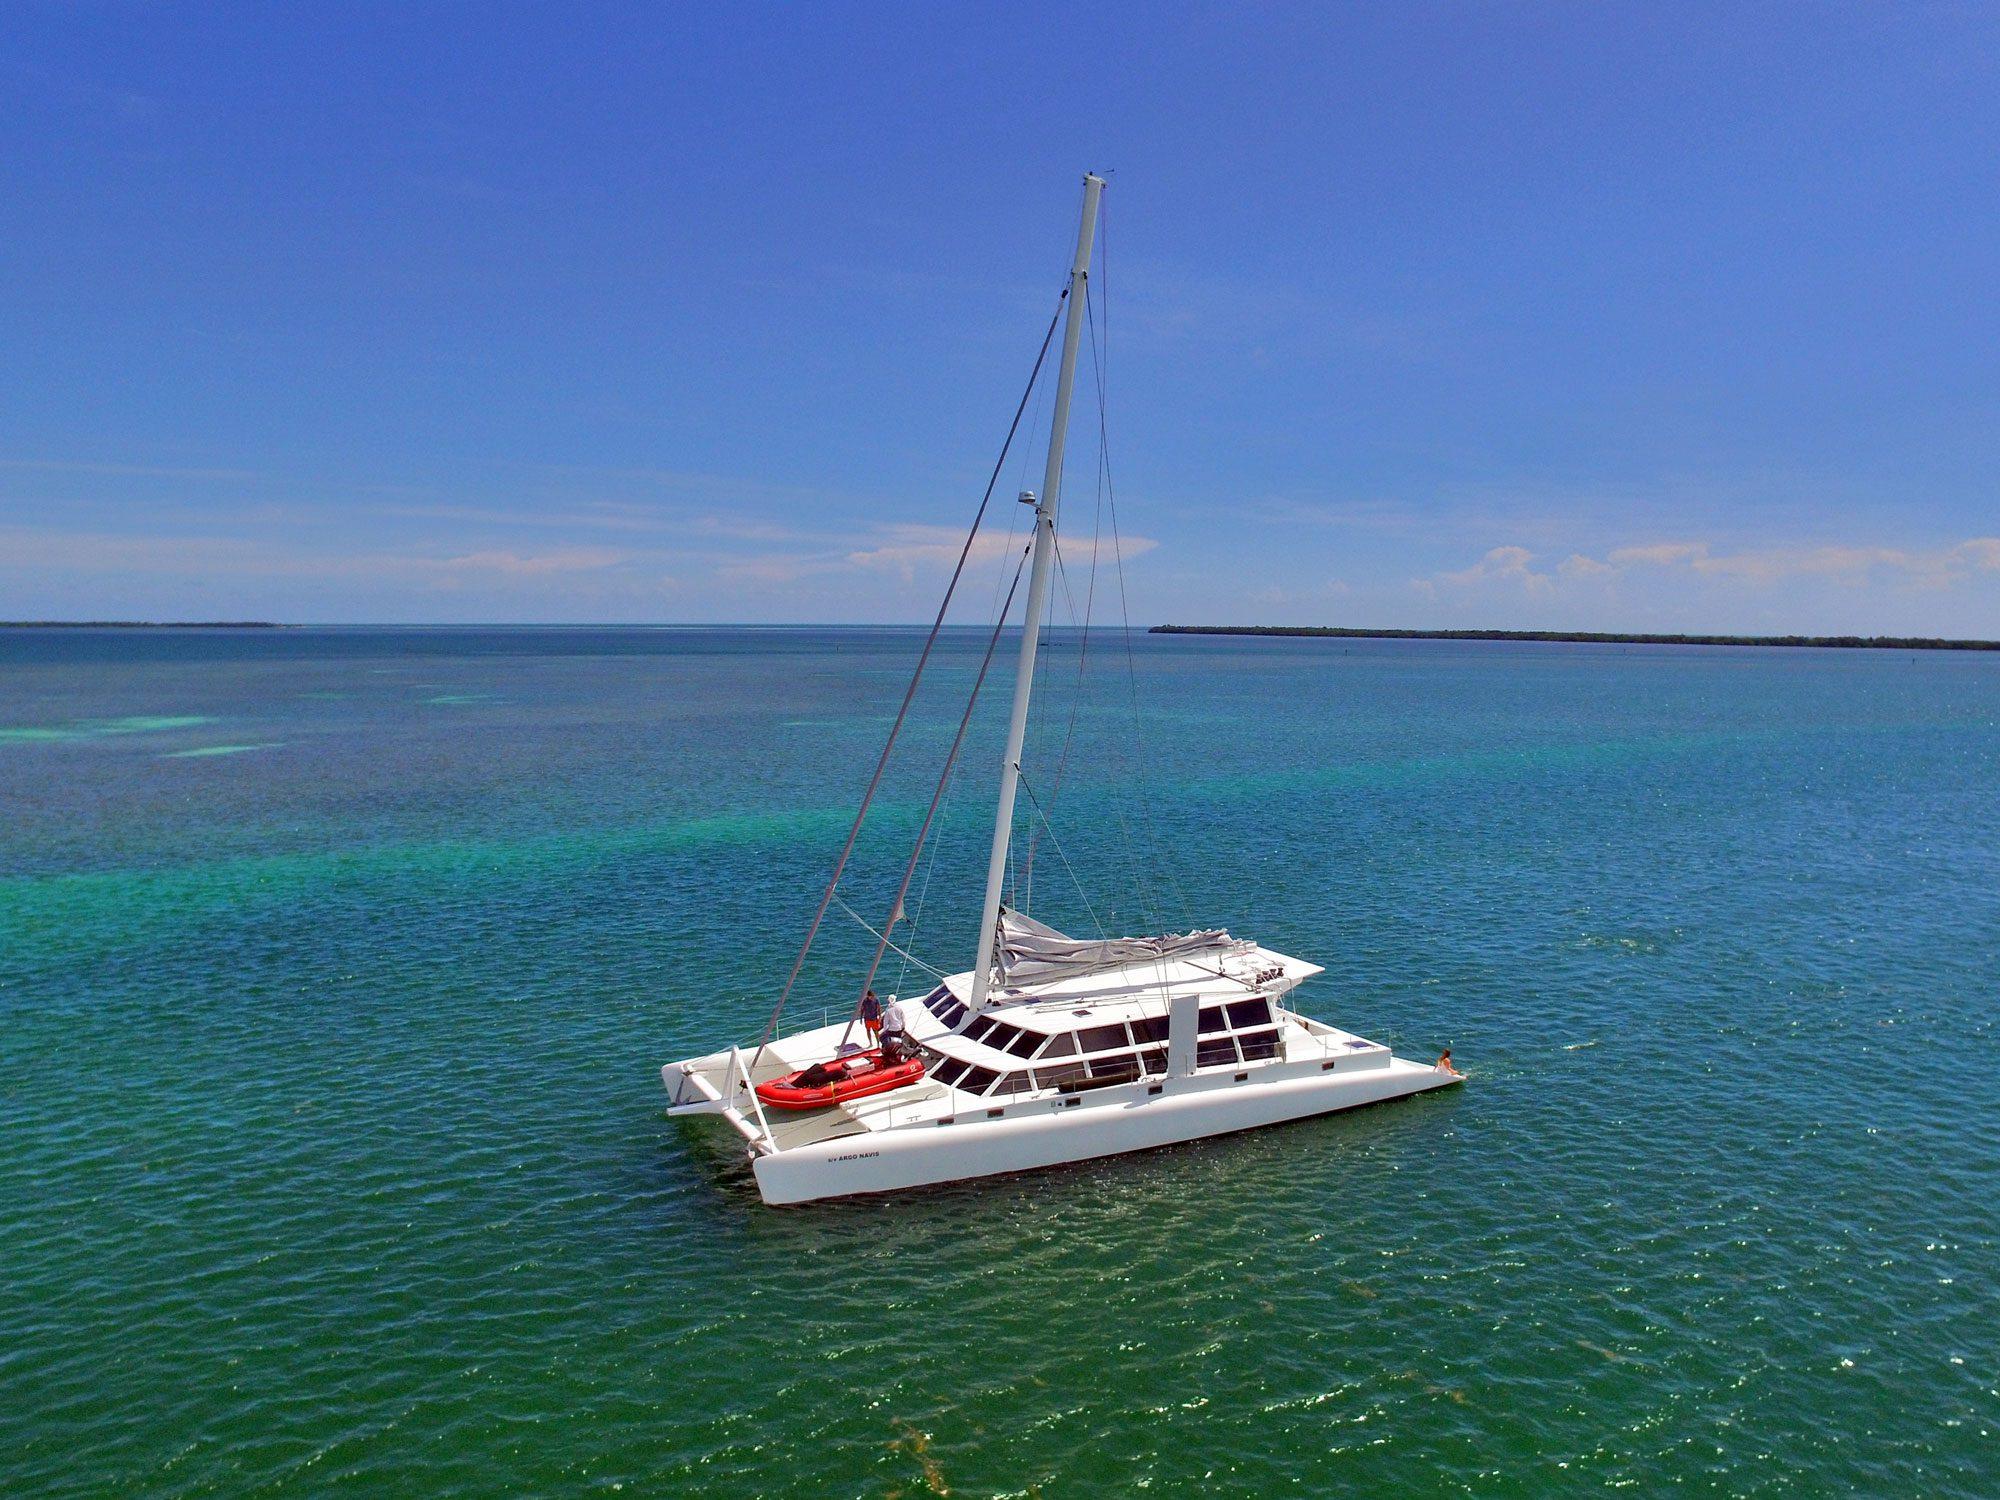 Argo Navis Key West Sailing Charter